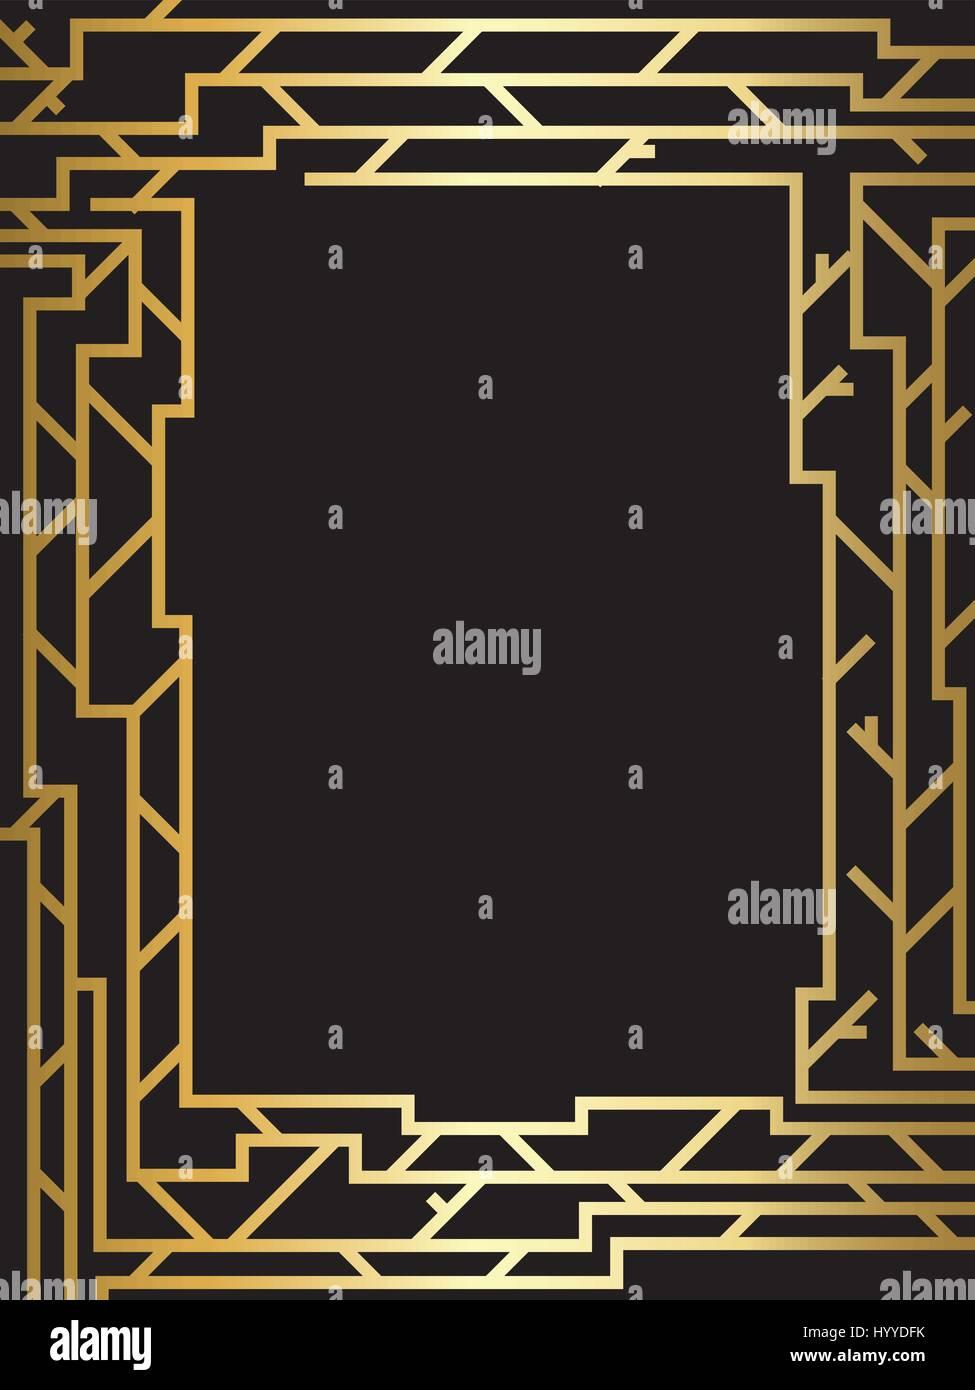 Gold Holz-Rahmen-Design. Web Design, Technologie, Wissenschaft ...